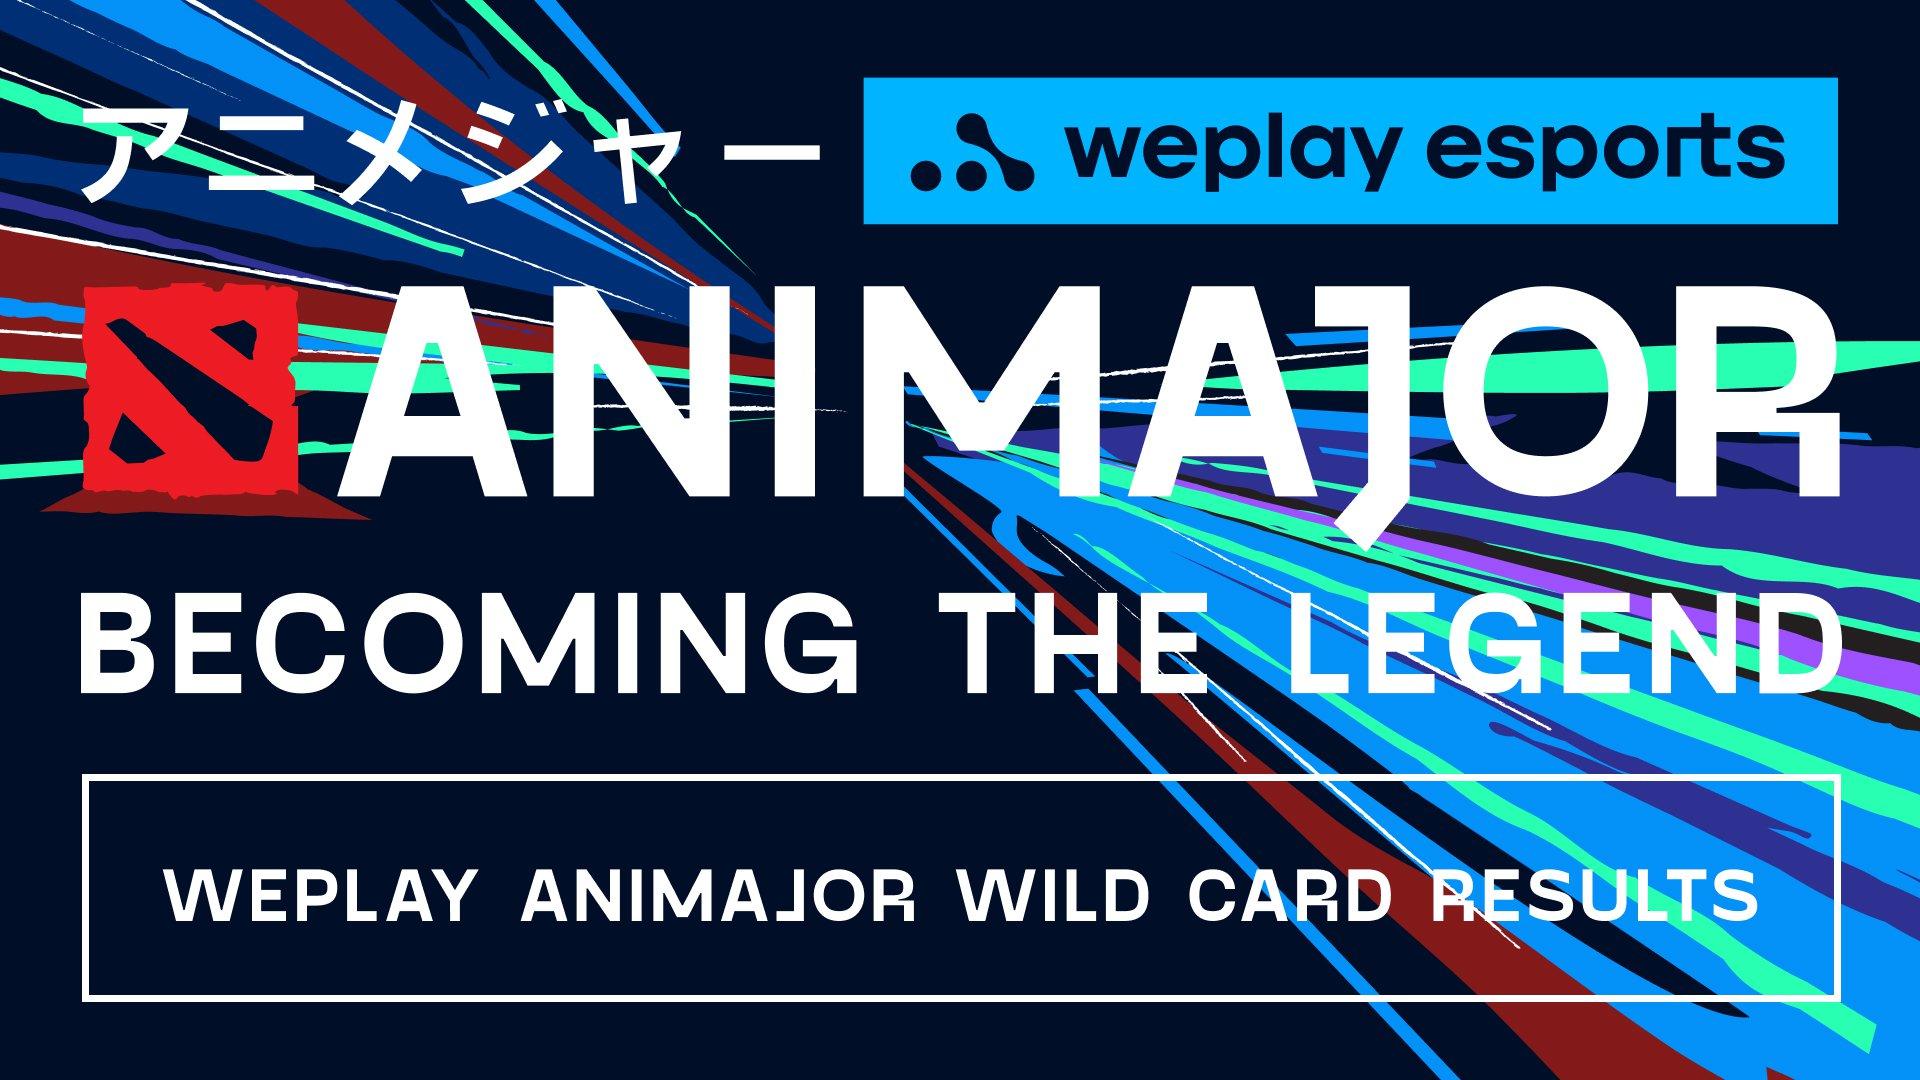 Результати етапу Wild Card WePlay AniMajor. Зображення: WePlay Esports